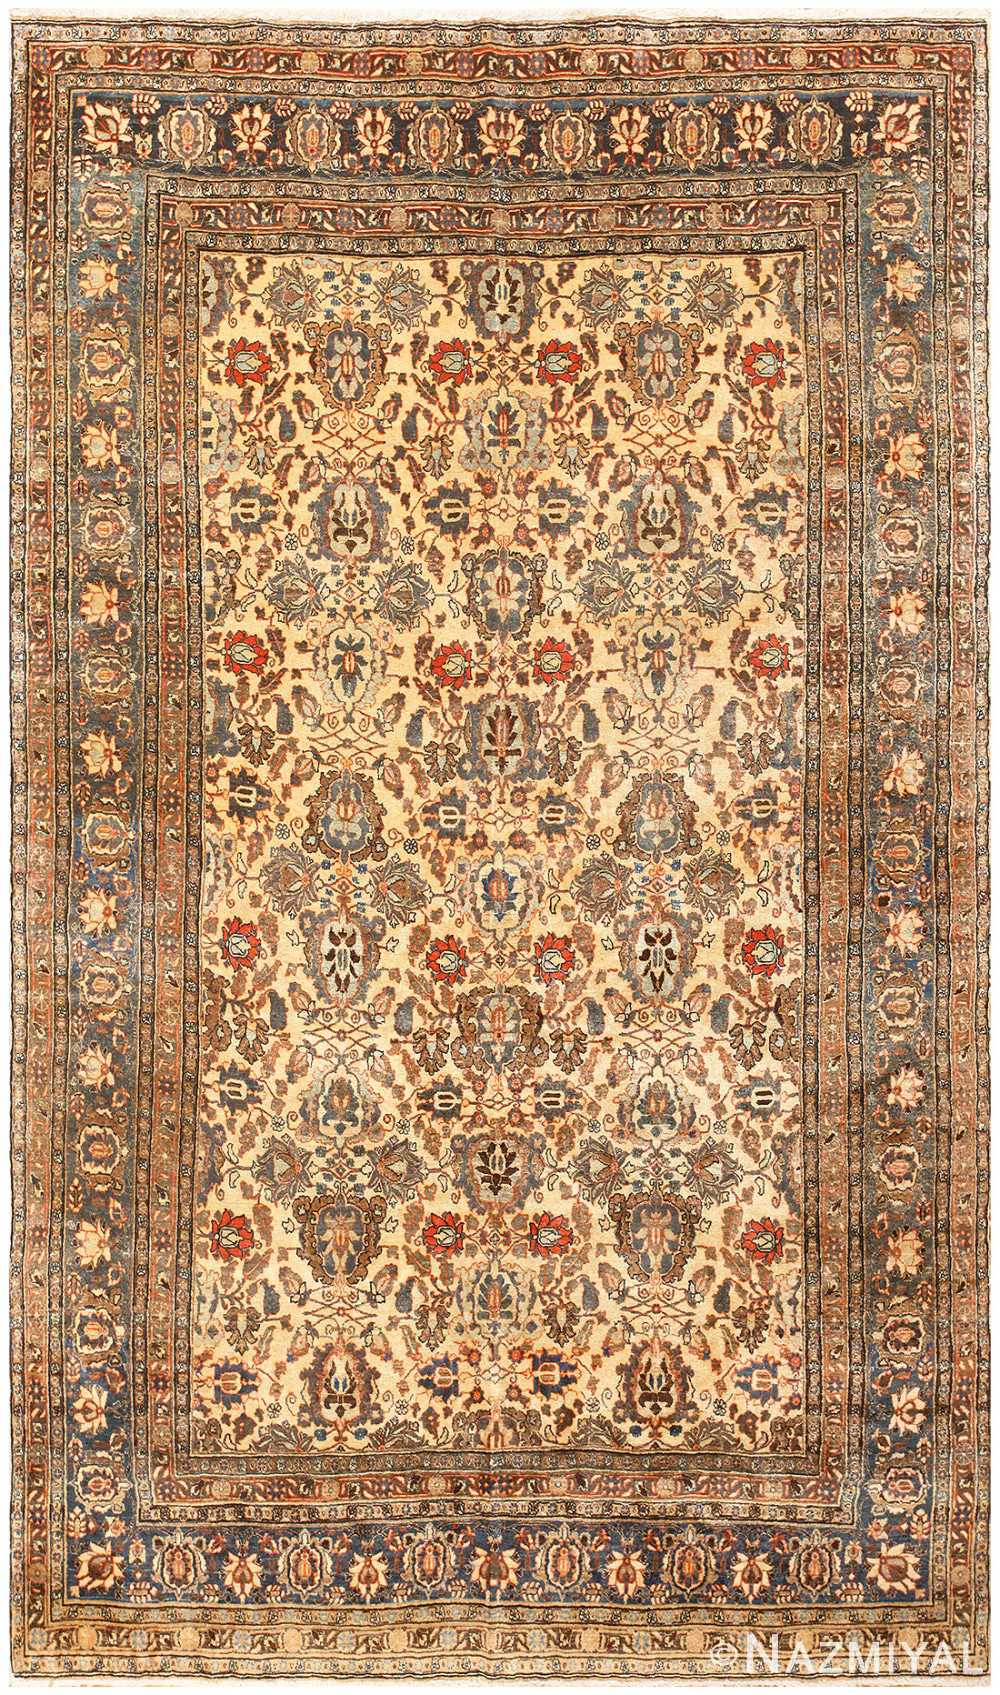 Antique Persian Tabriz Rug 50155 Detail/Large View